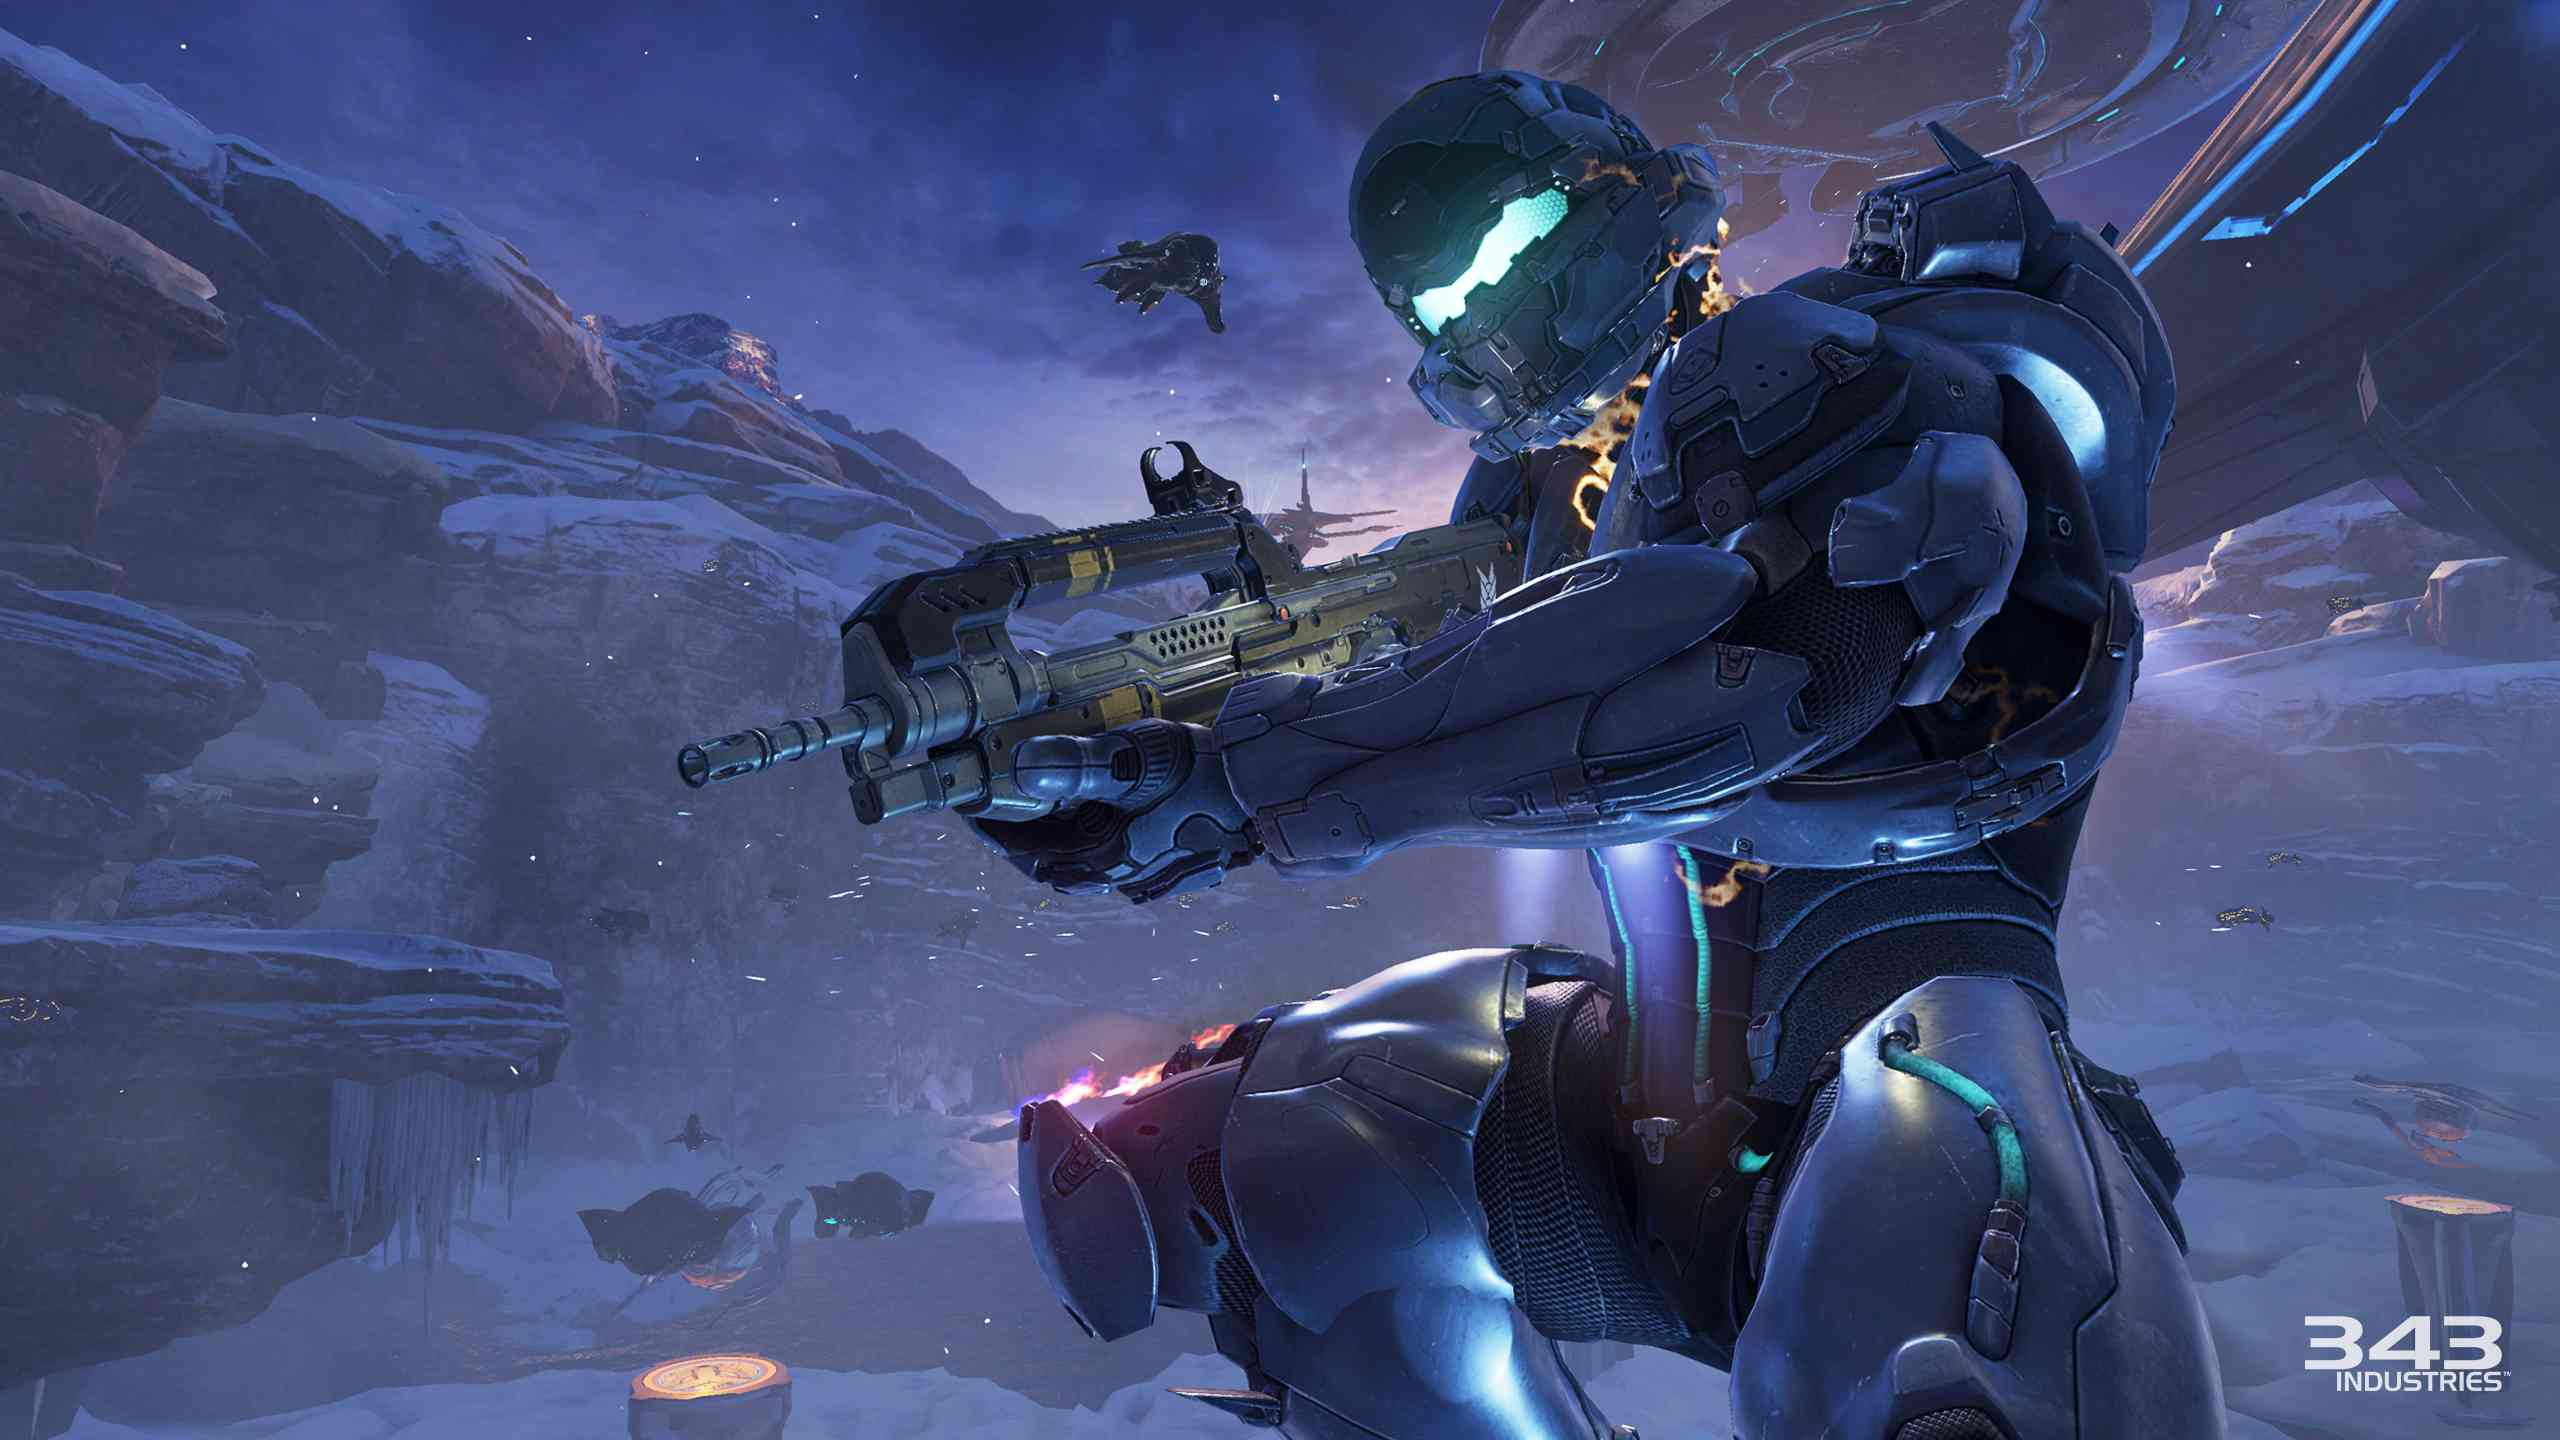 Halo 5 screen